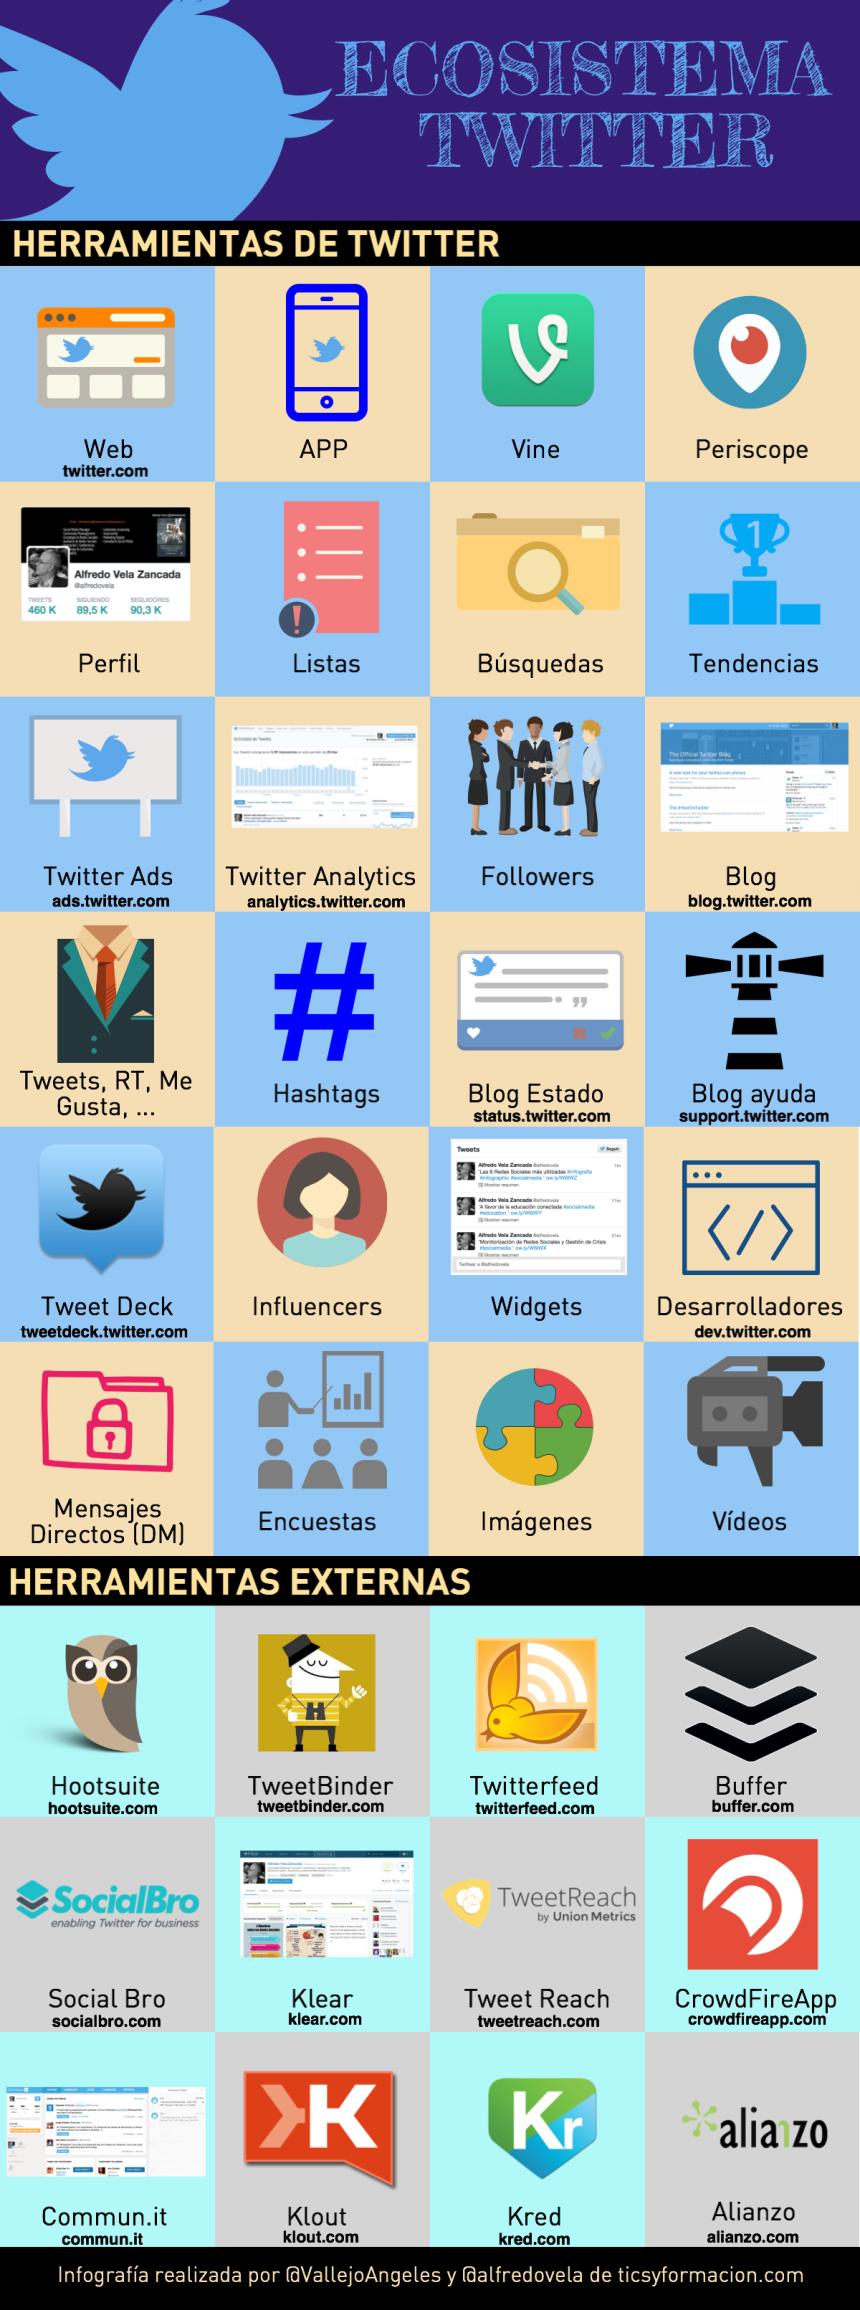 Ecosistema Twitter